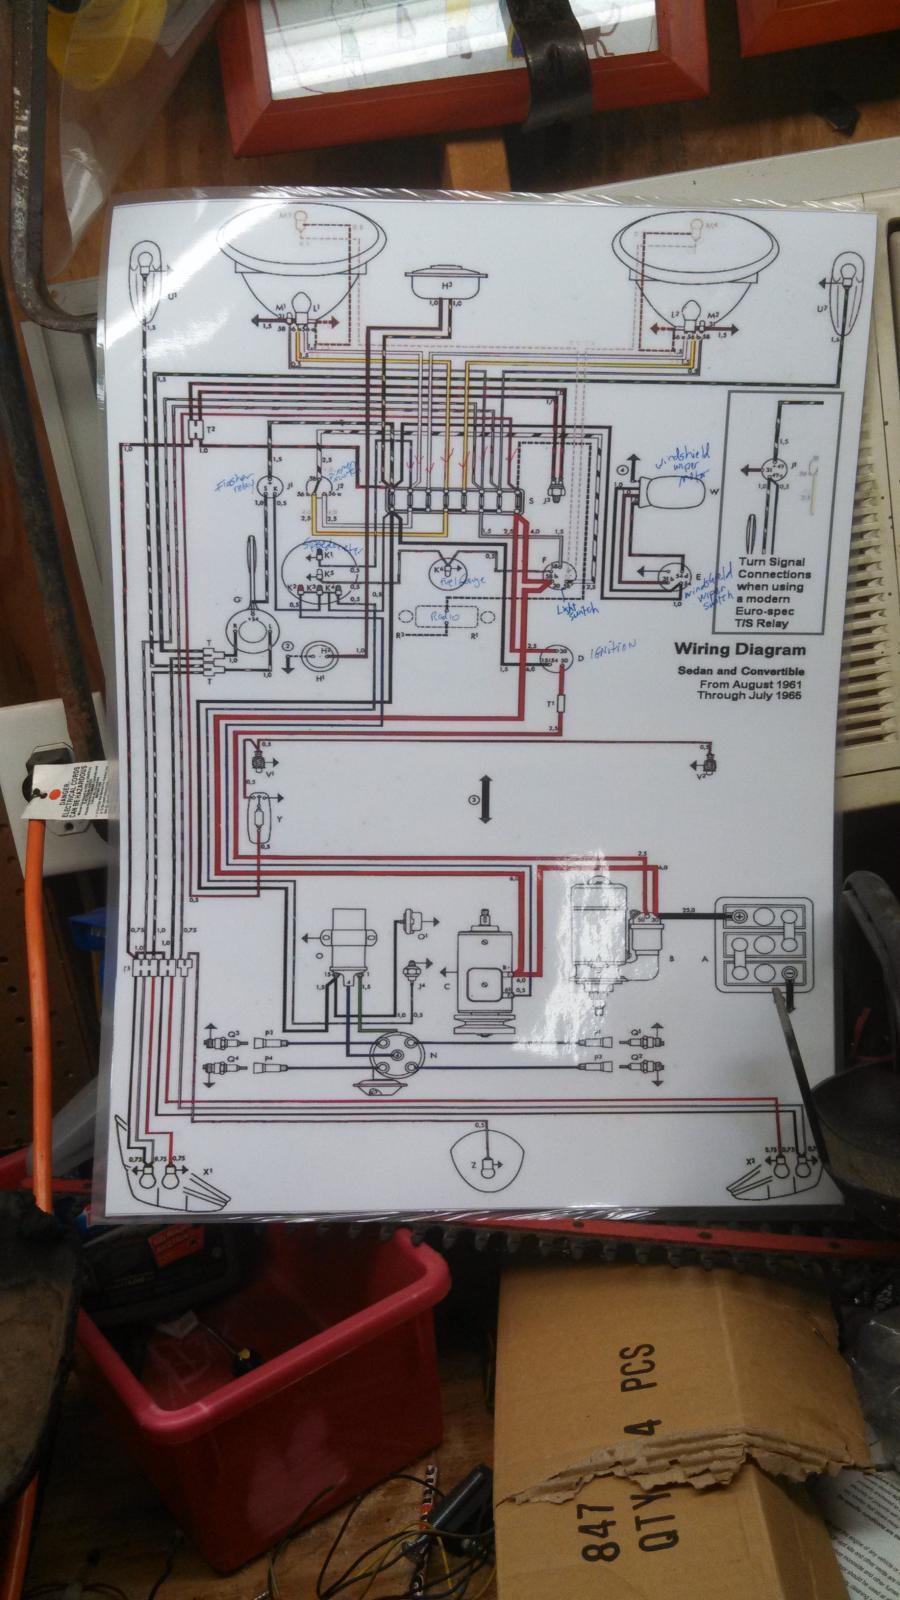 Sparkomatic Radio Wiring Diagrams - Diagram Engine | Sparkomatic Wiring Diagram |  | Diagram Engine